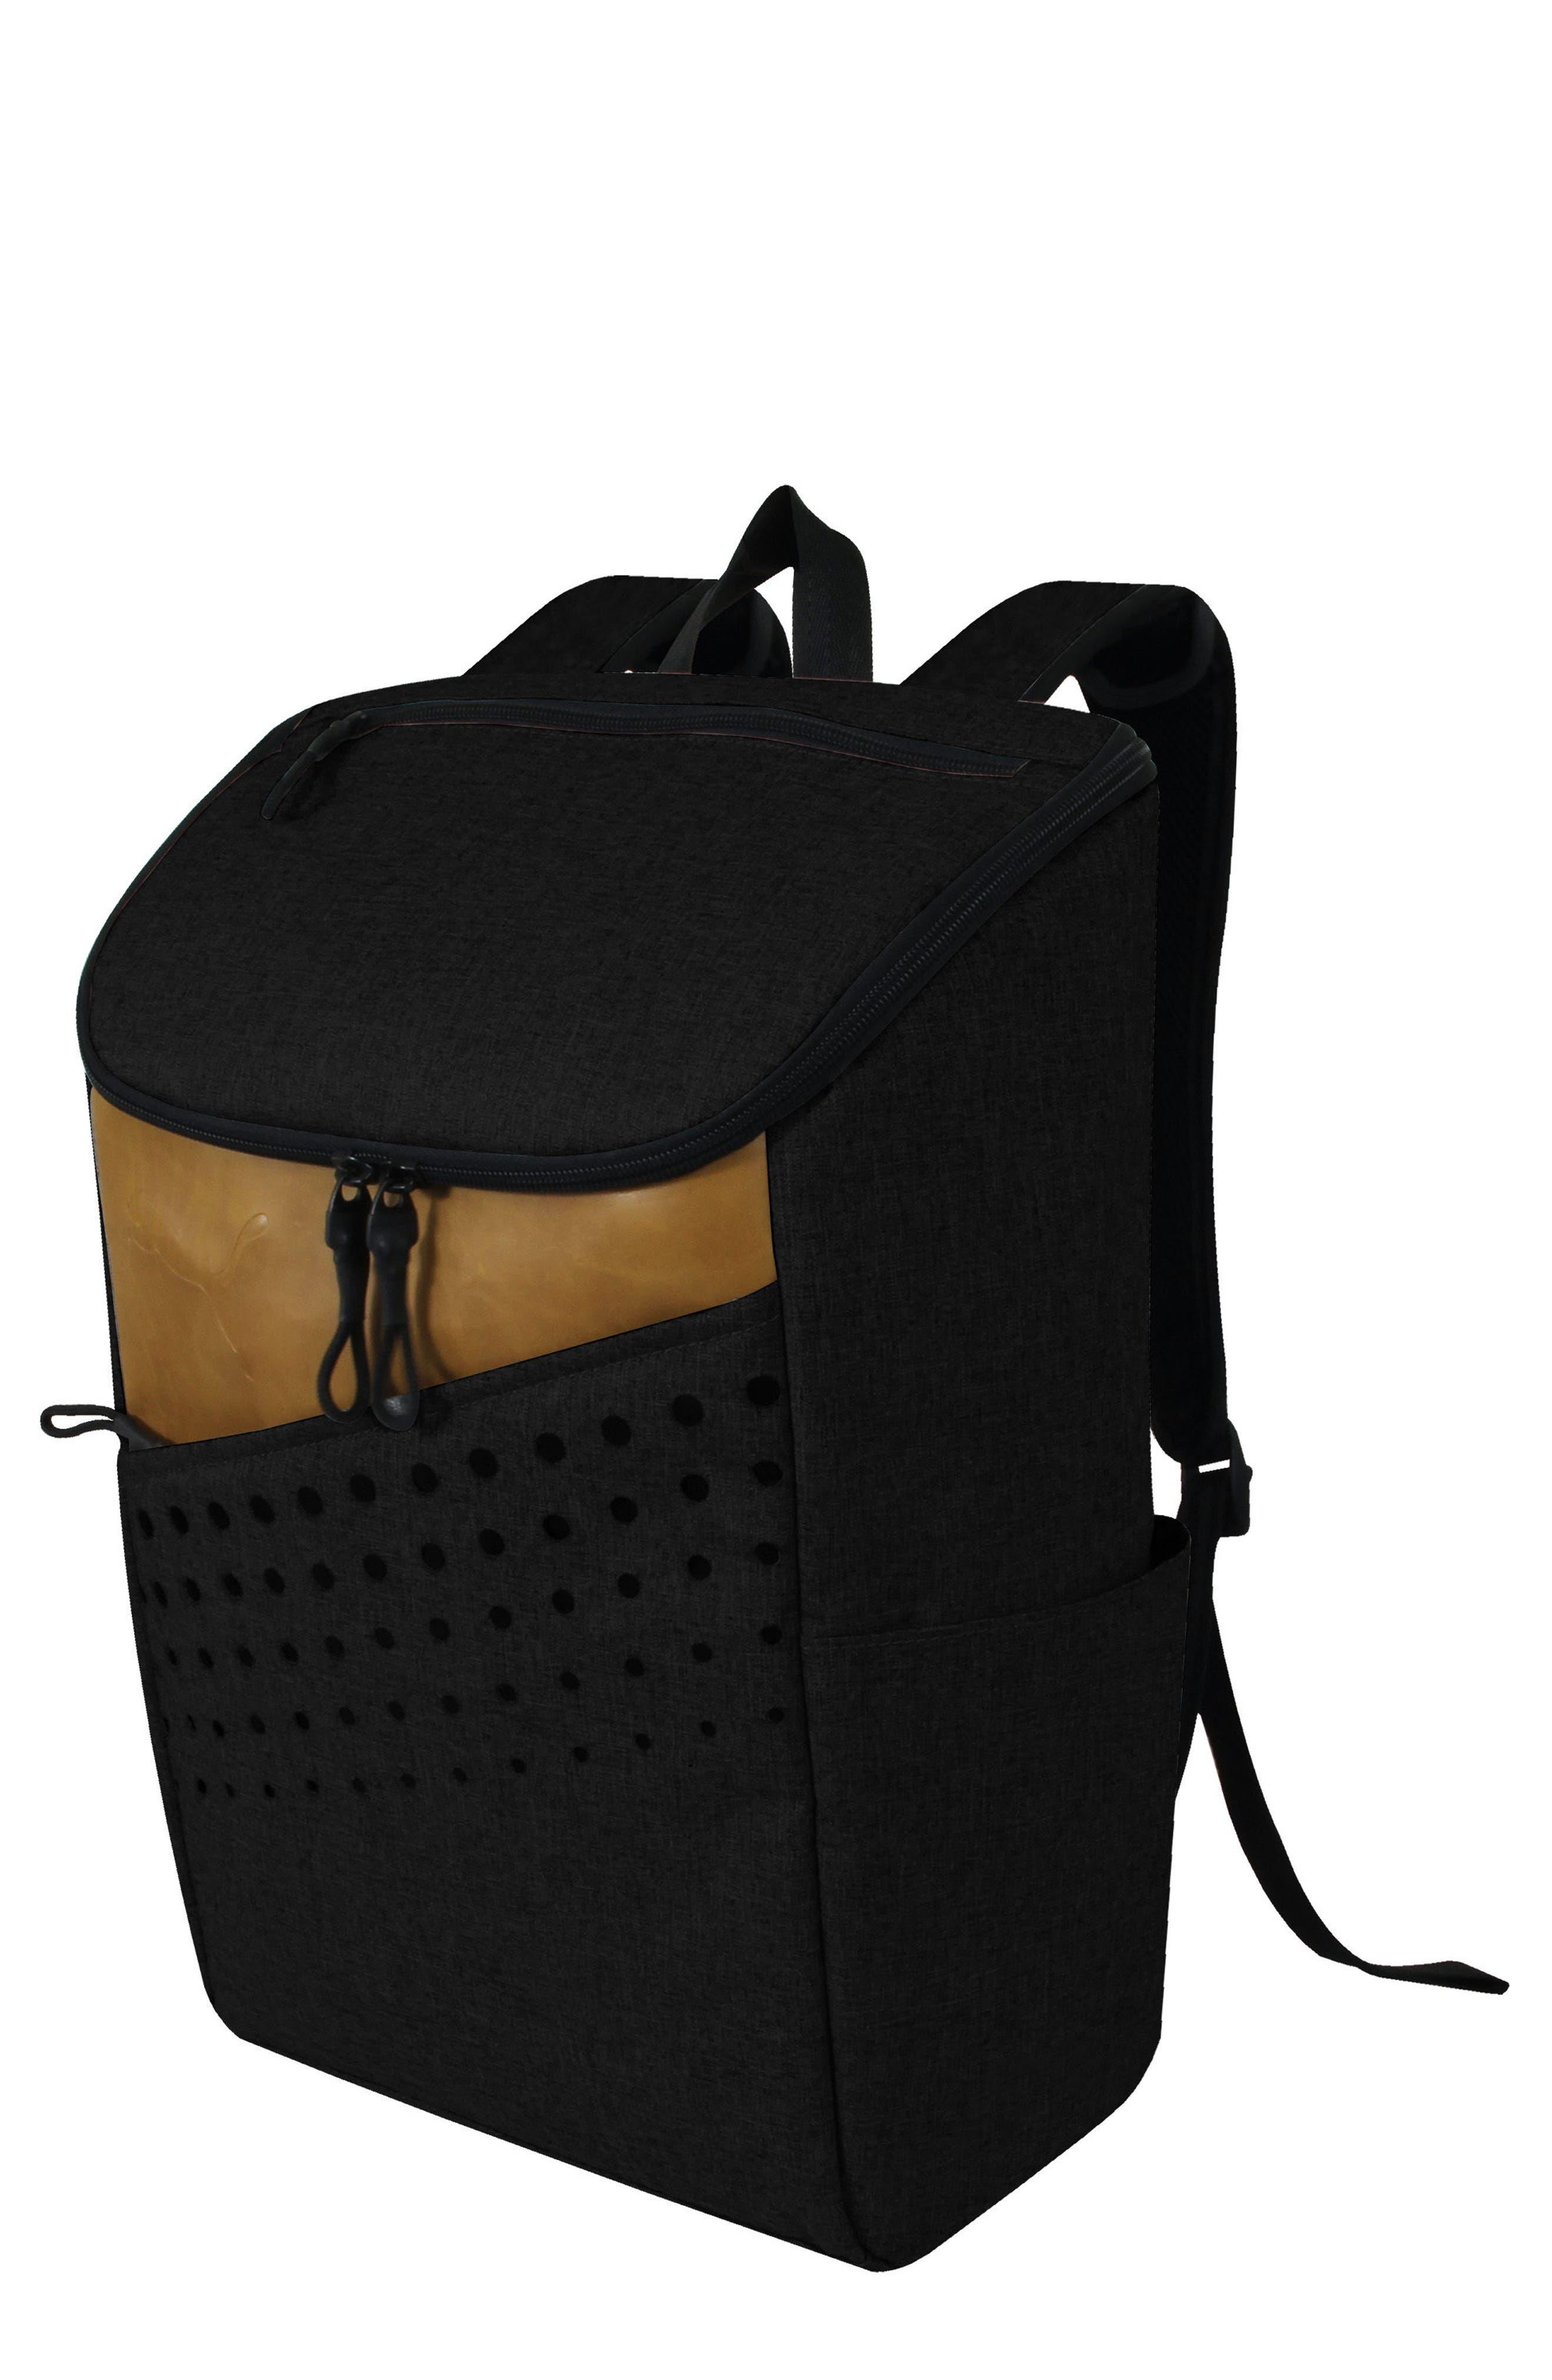 Dominator Backpack,                             Main thumbnail 1, color,                             001